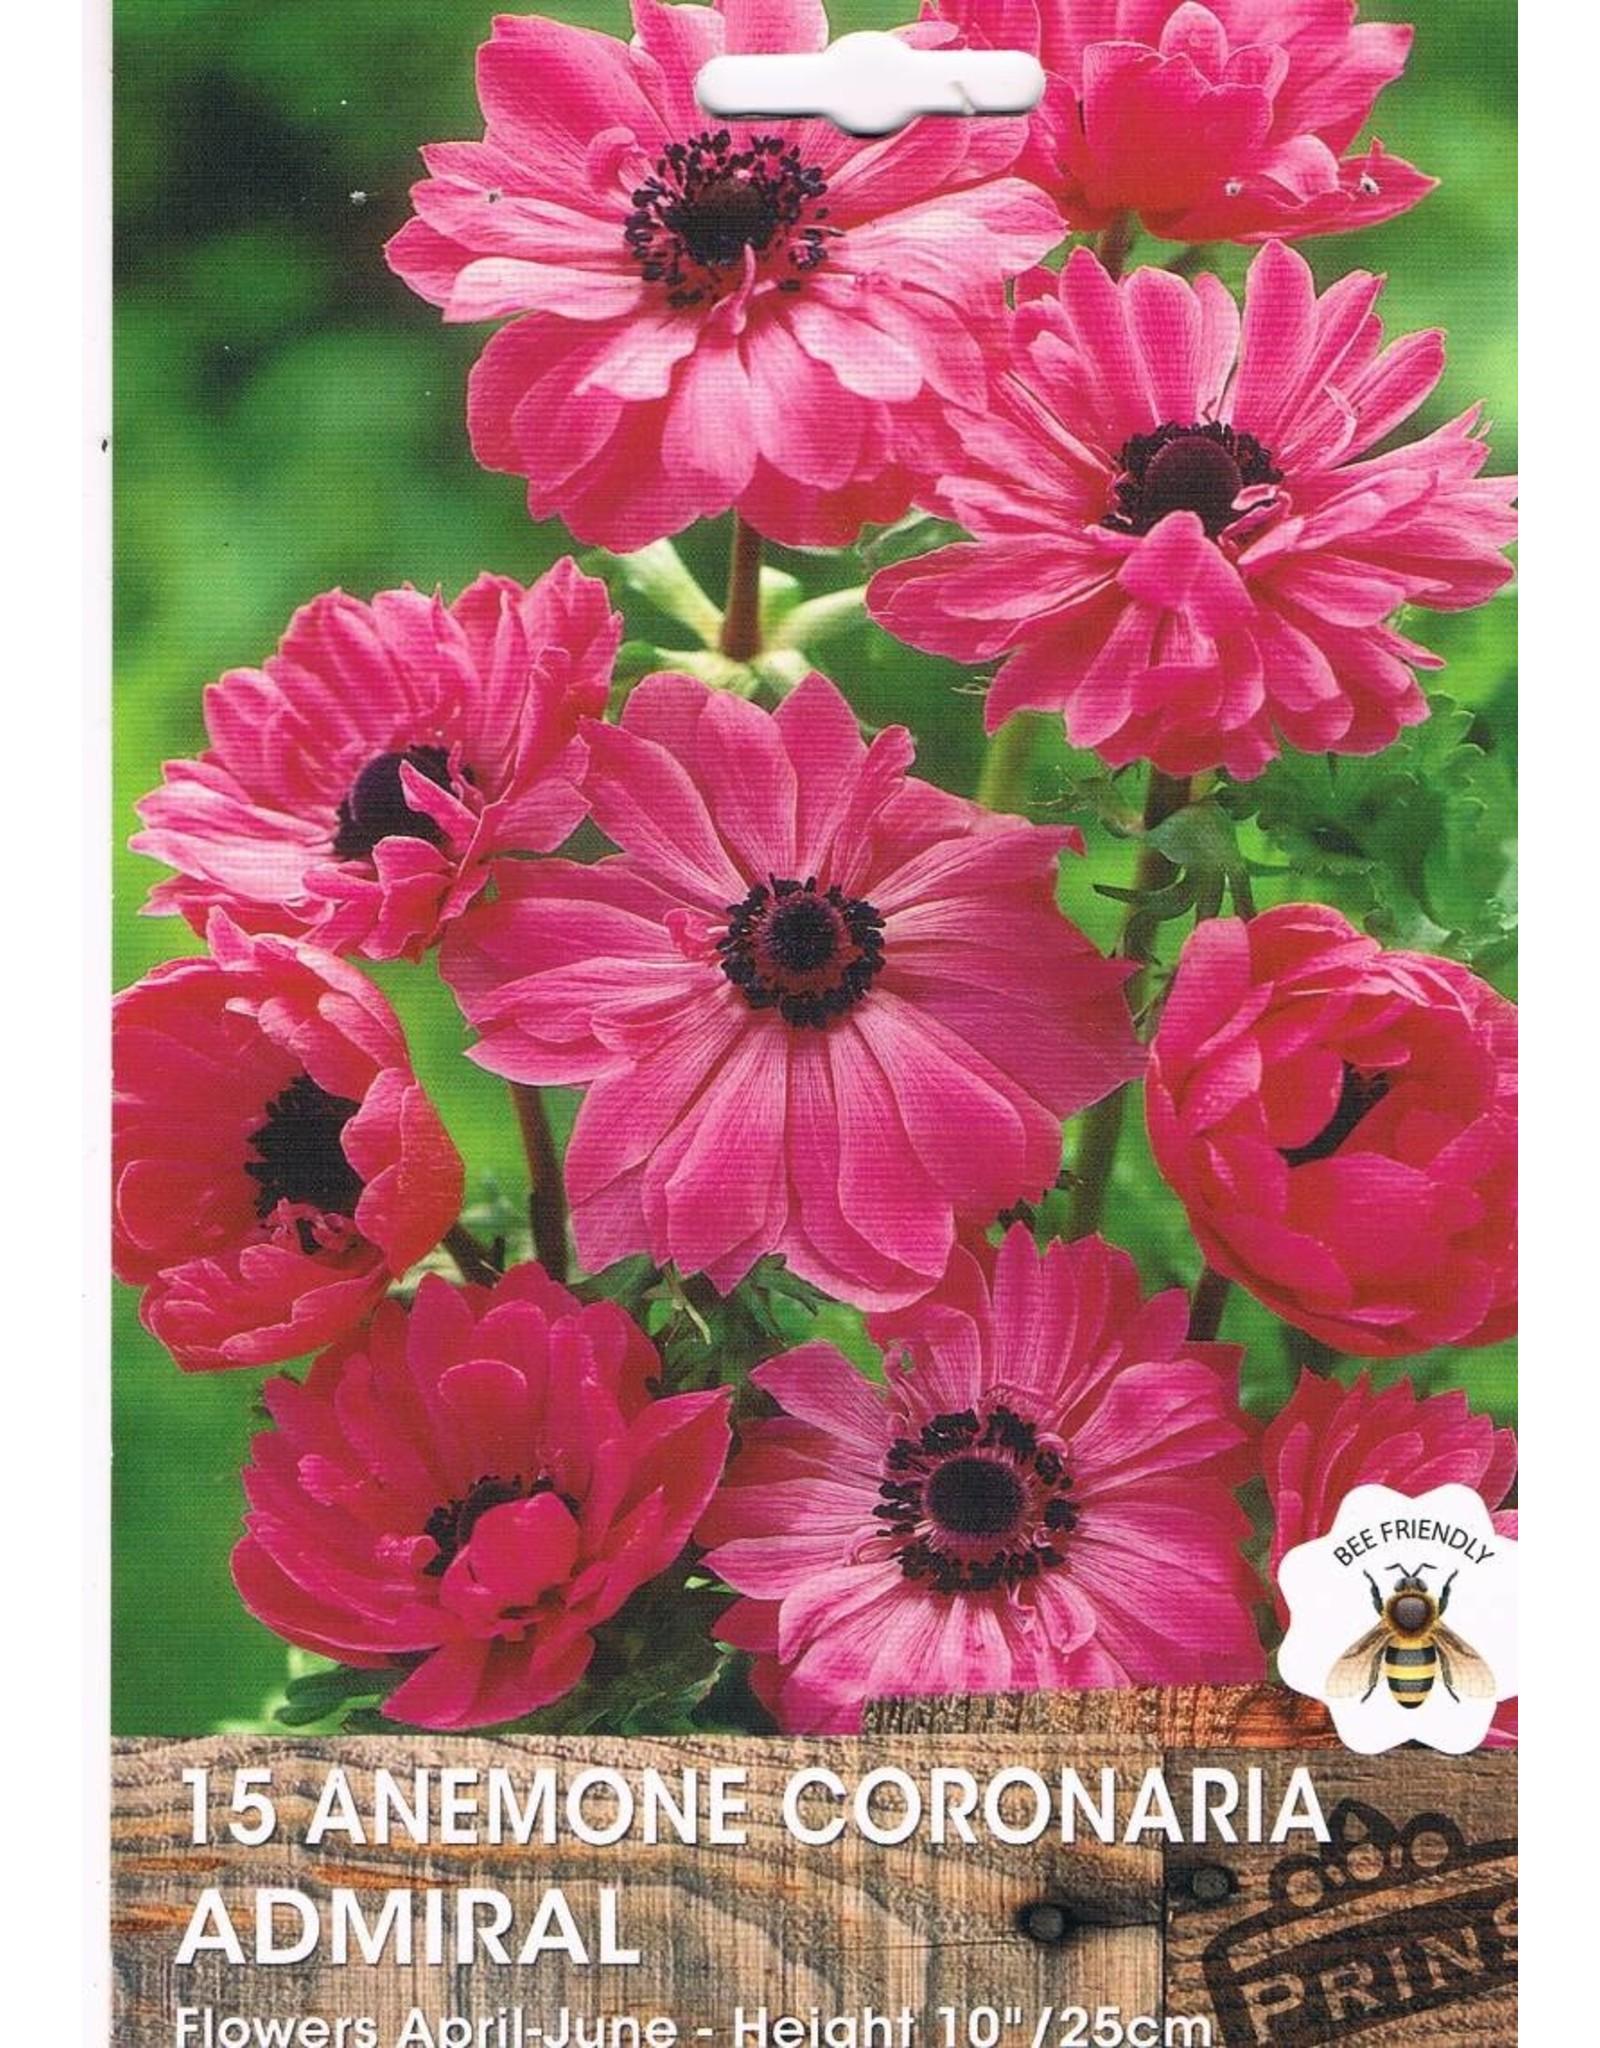 Hollands geteeld Anemione coronaria Admiral